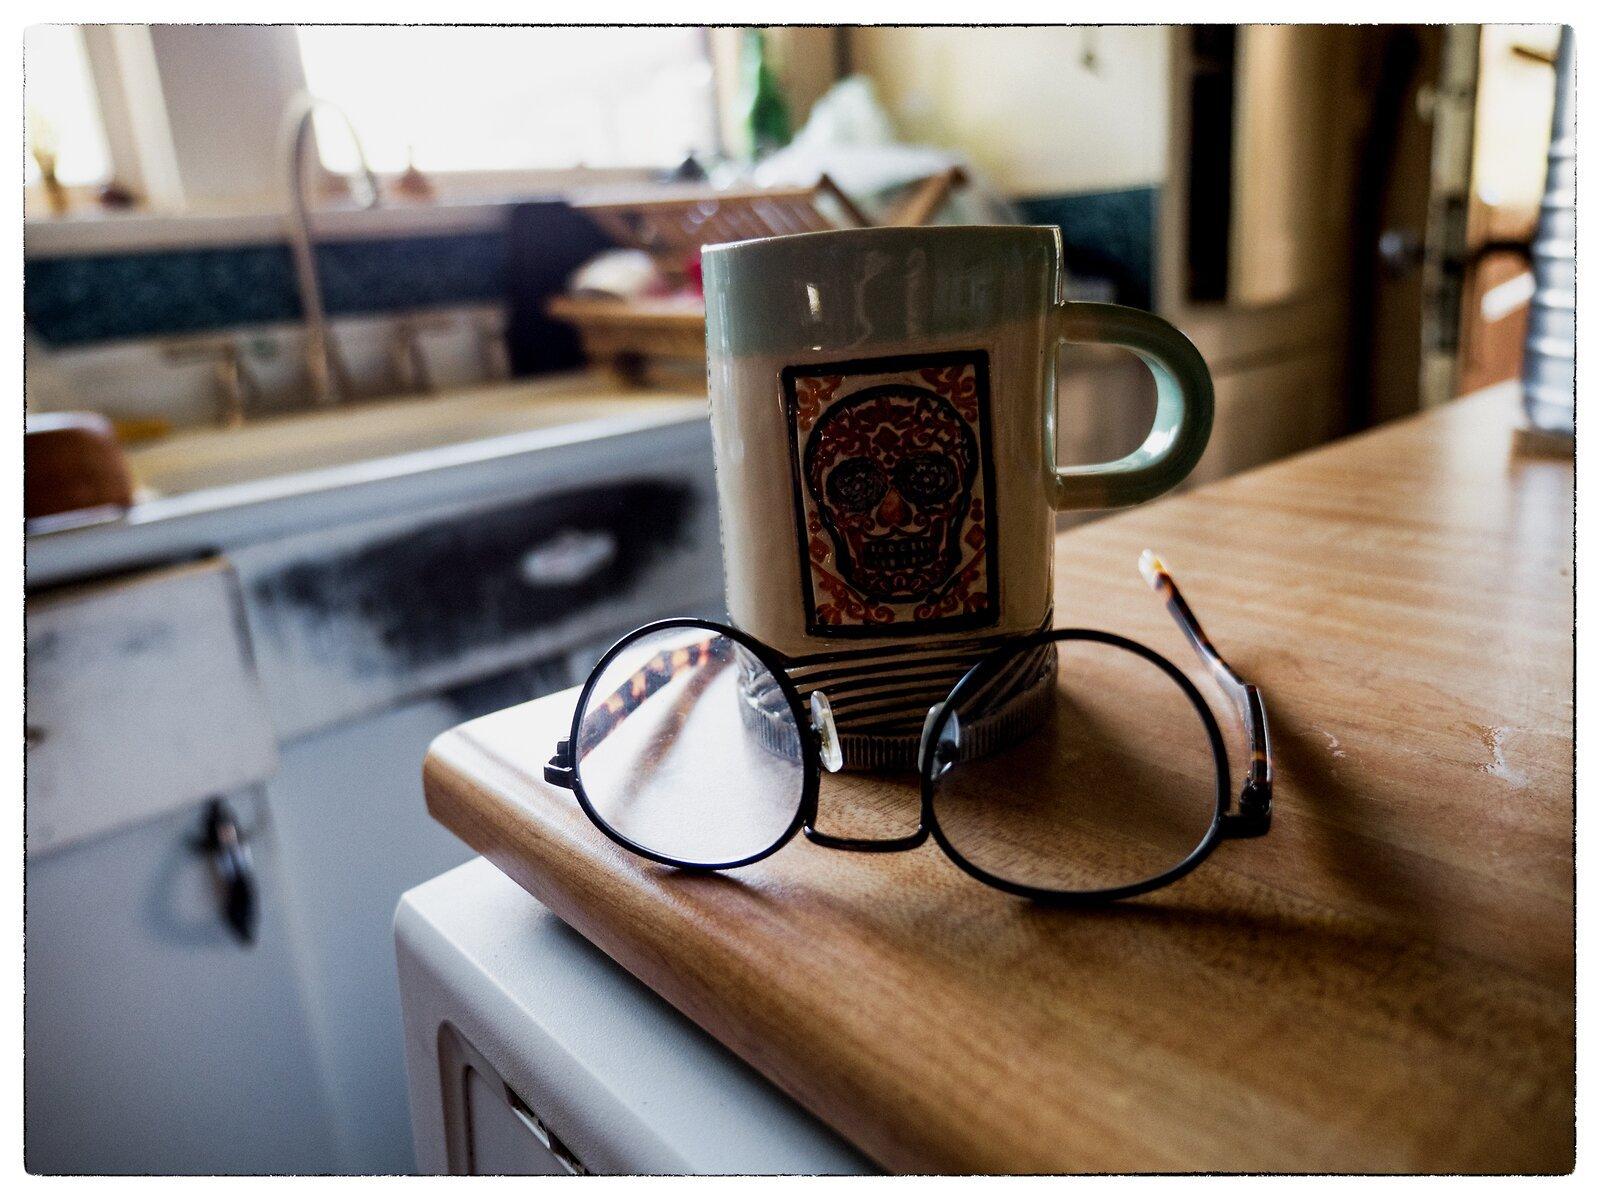 GX9_June13_21_glasses+calavera_coffee_cup.jpg